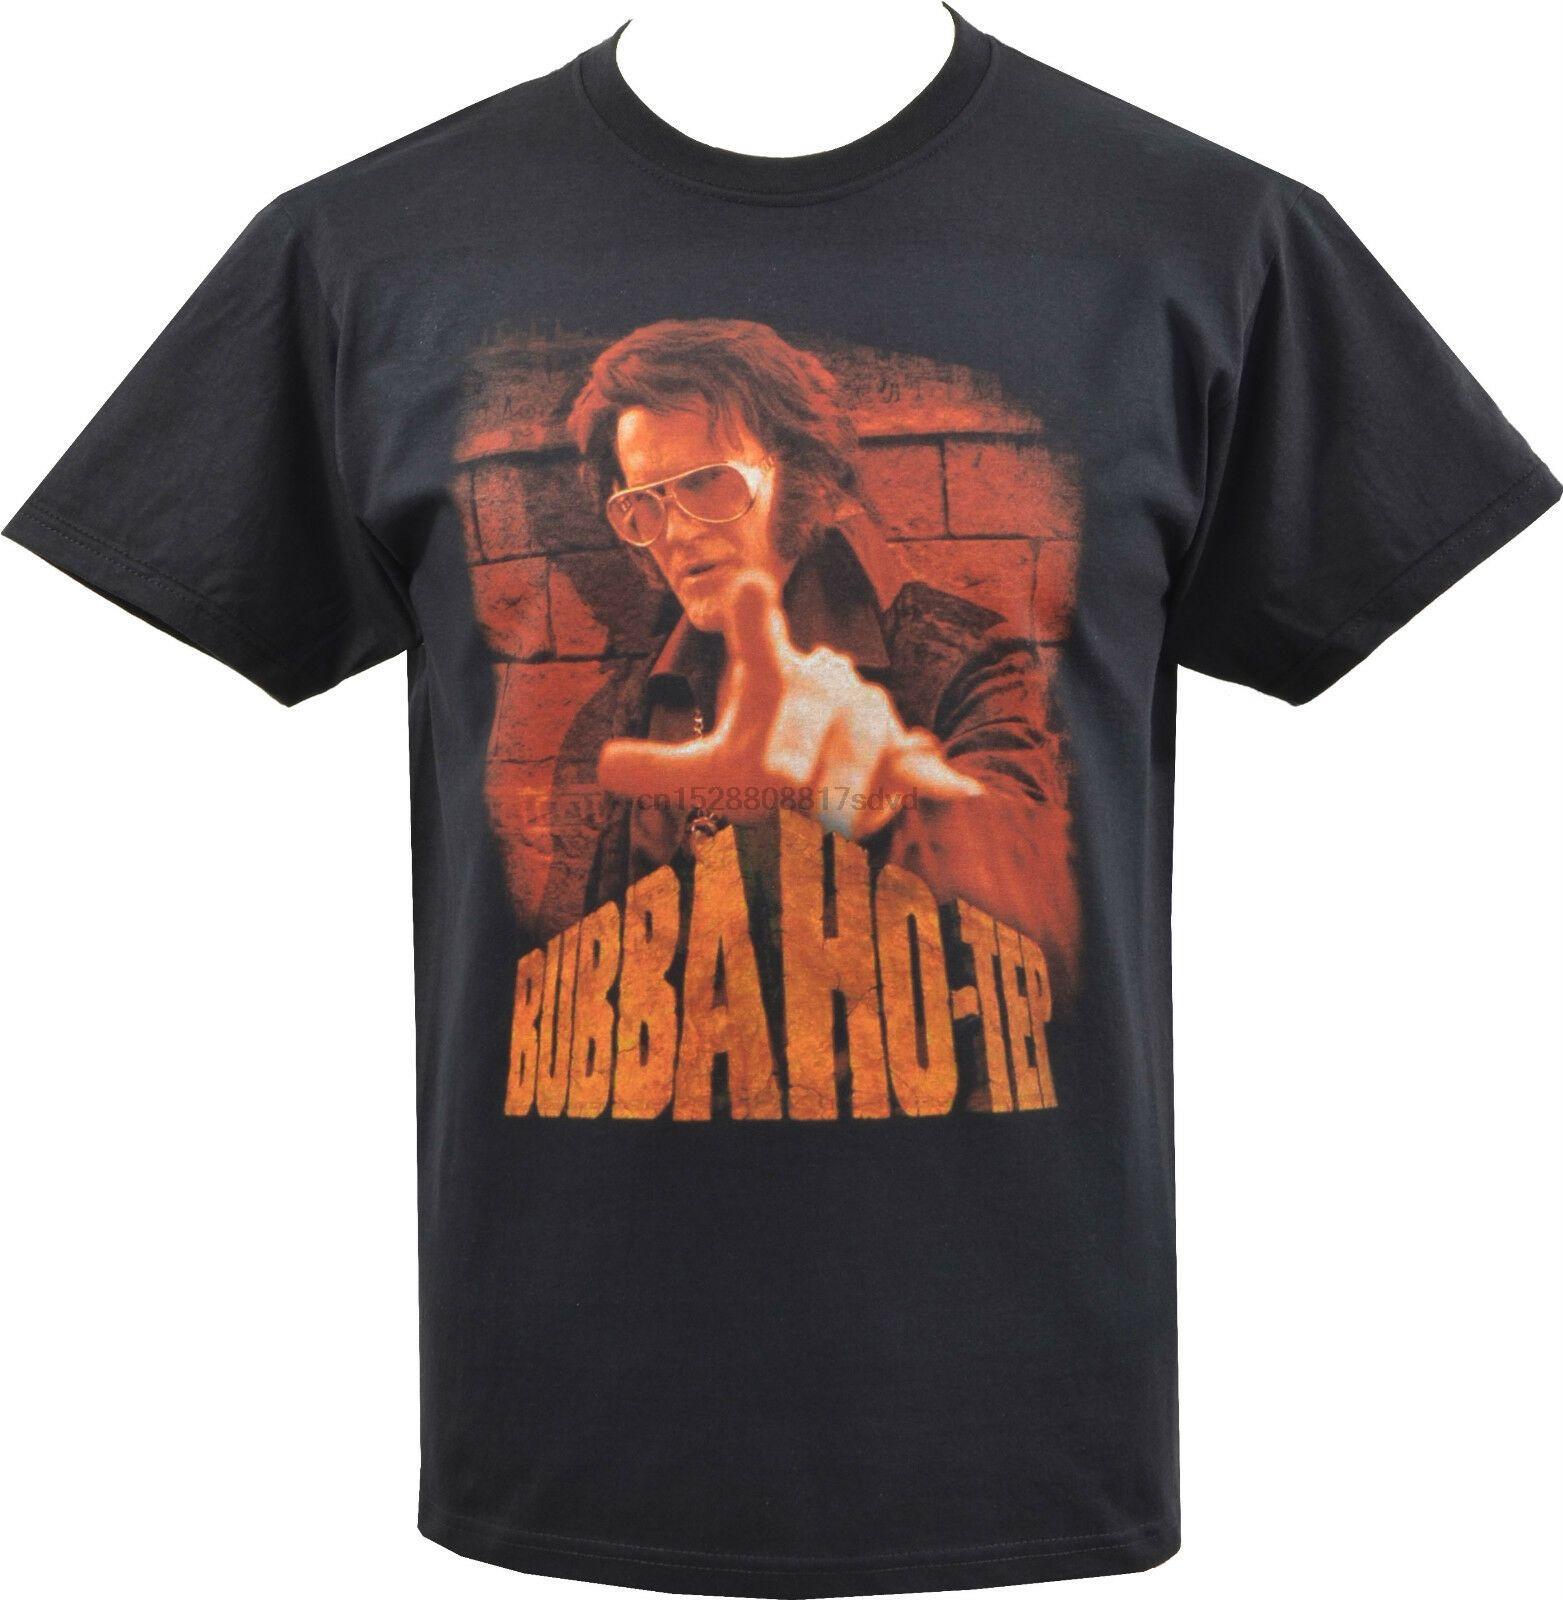 Preto dos homens T-shirt Bubba Ho-TEP MUMMY comédia de horror FILM ELVIS PRESLEY JFK manga curta Hip Hop Tee T Shirt top tee